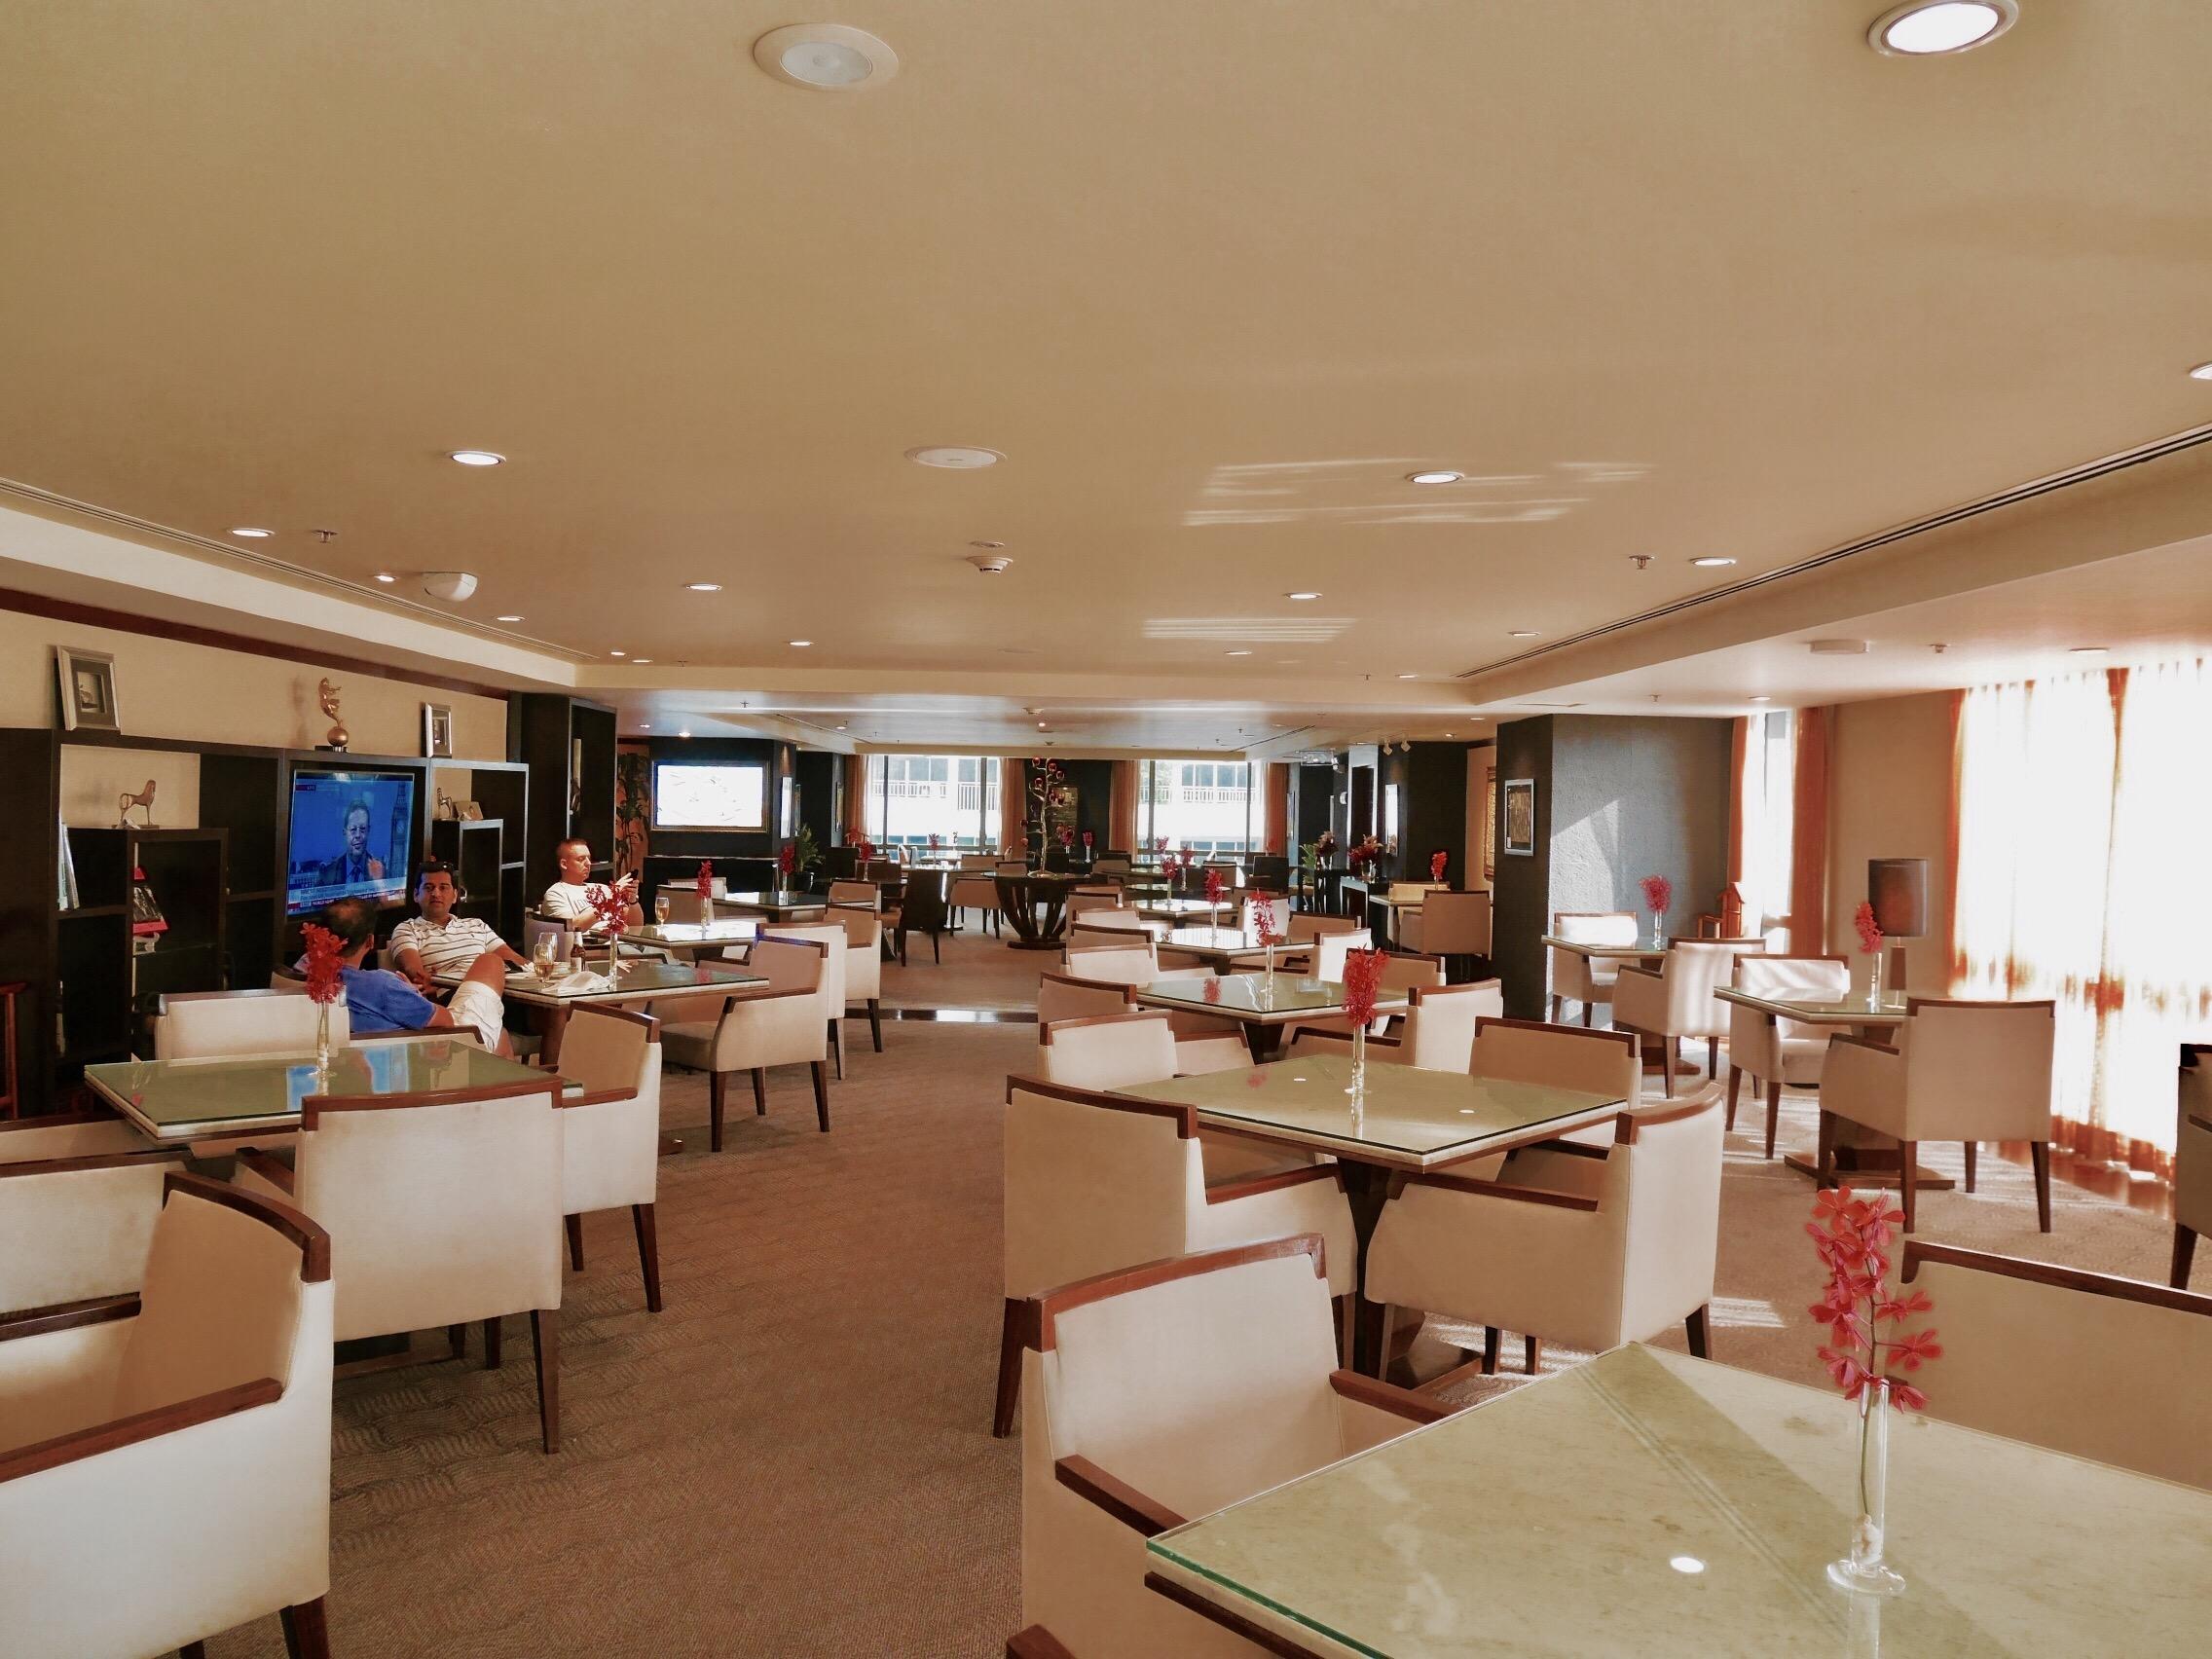 img 8216 - Banyan Tree Bangkok - 五つ星ホテルバンヤンツリーのSERENITY CLUBで過ごすリュクスな時間 「客室編」